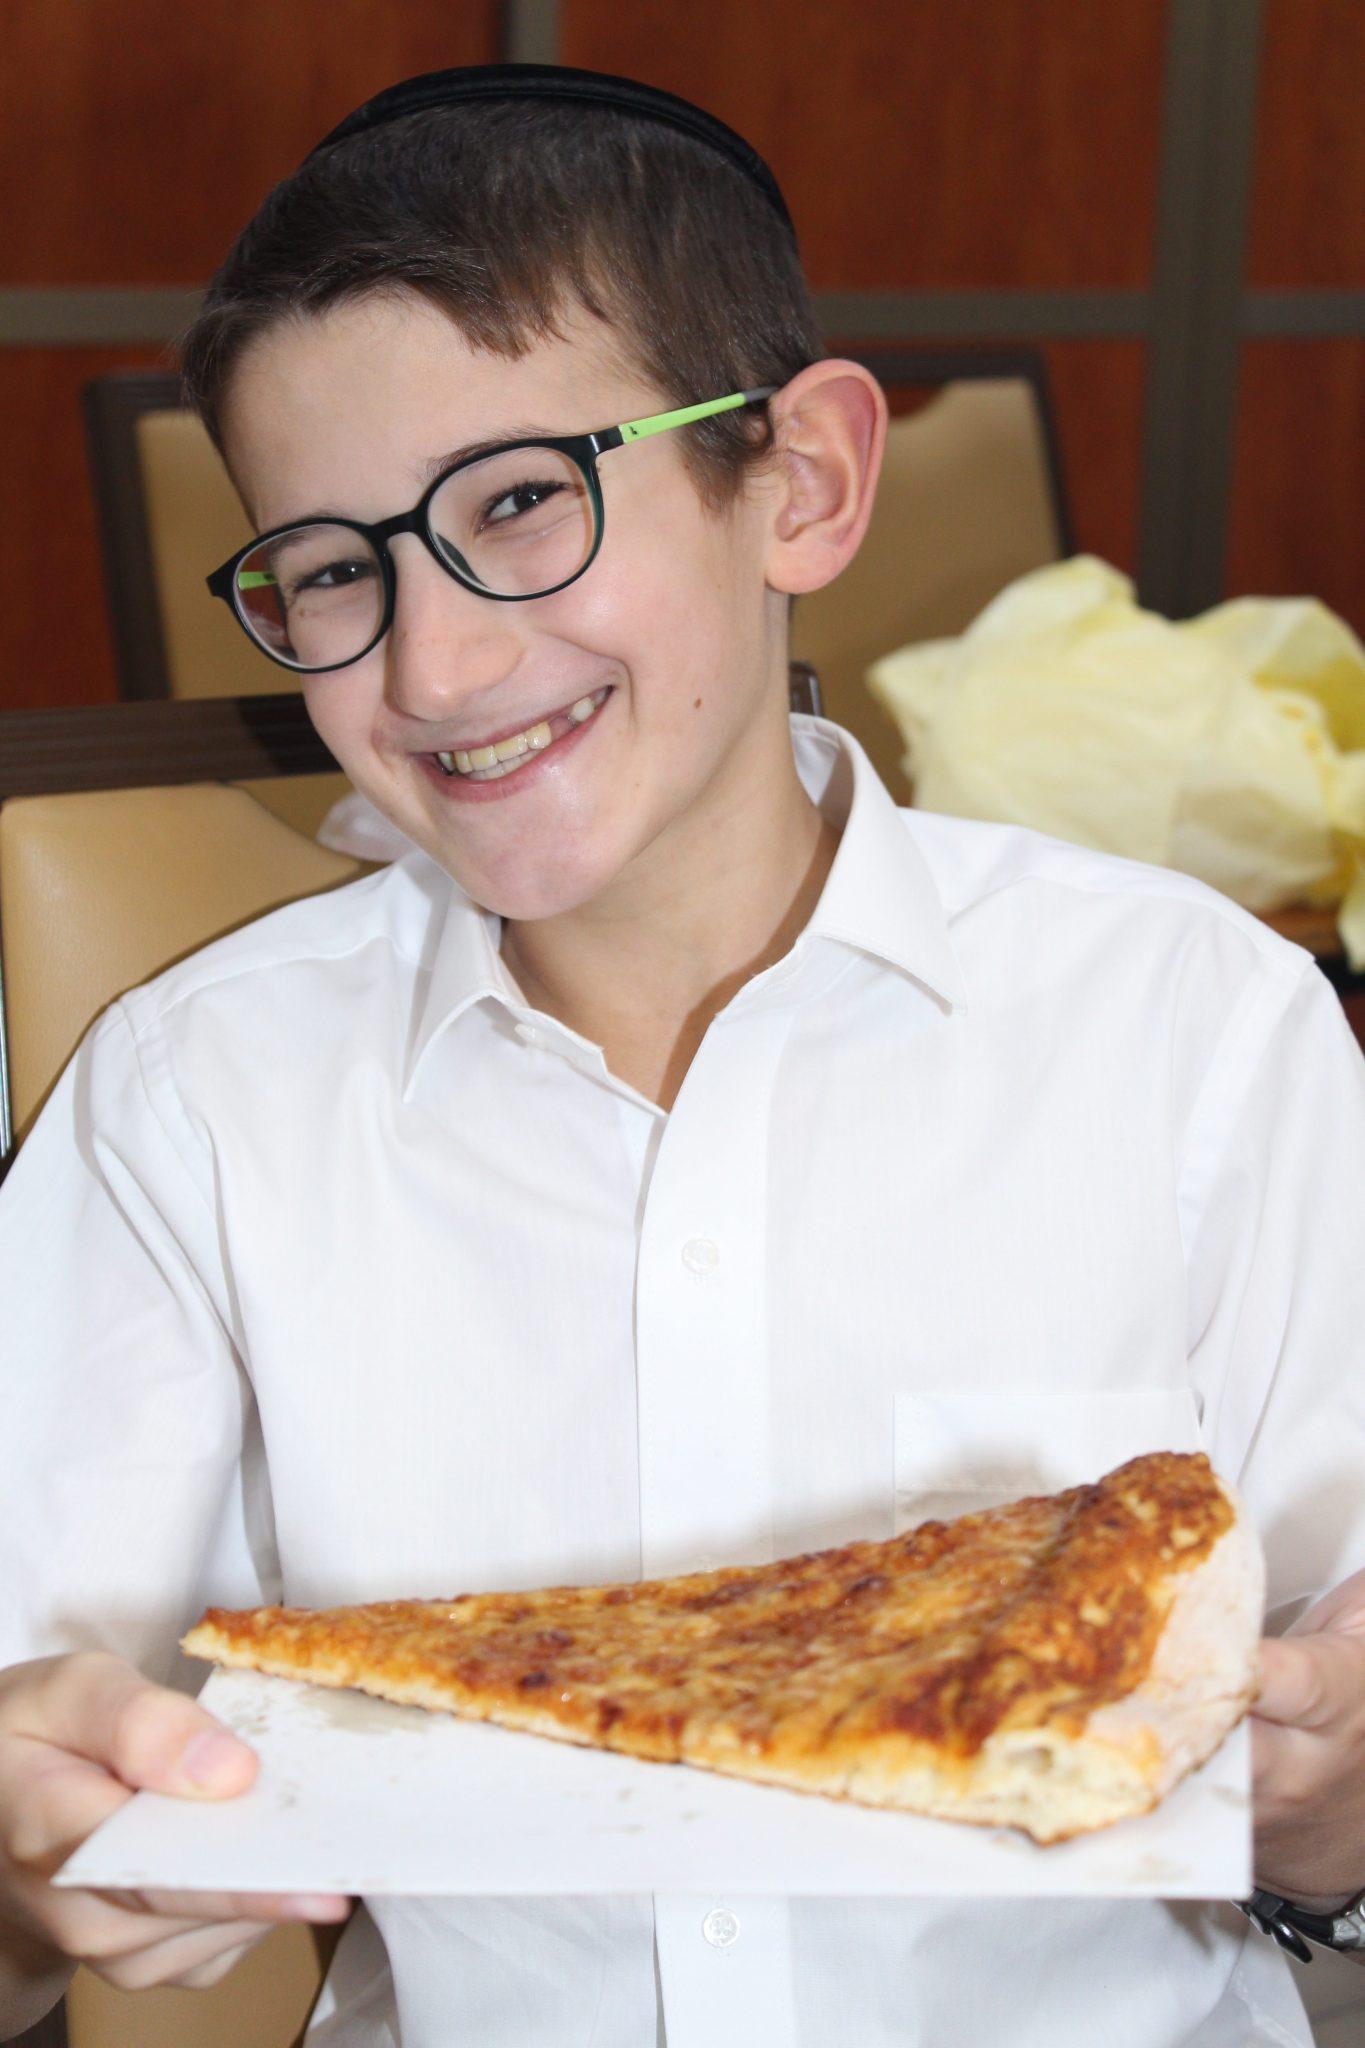 Avos uBanim Pizza Party